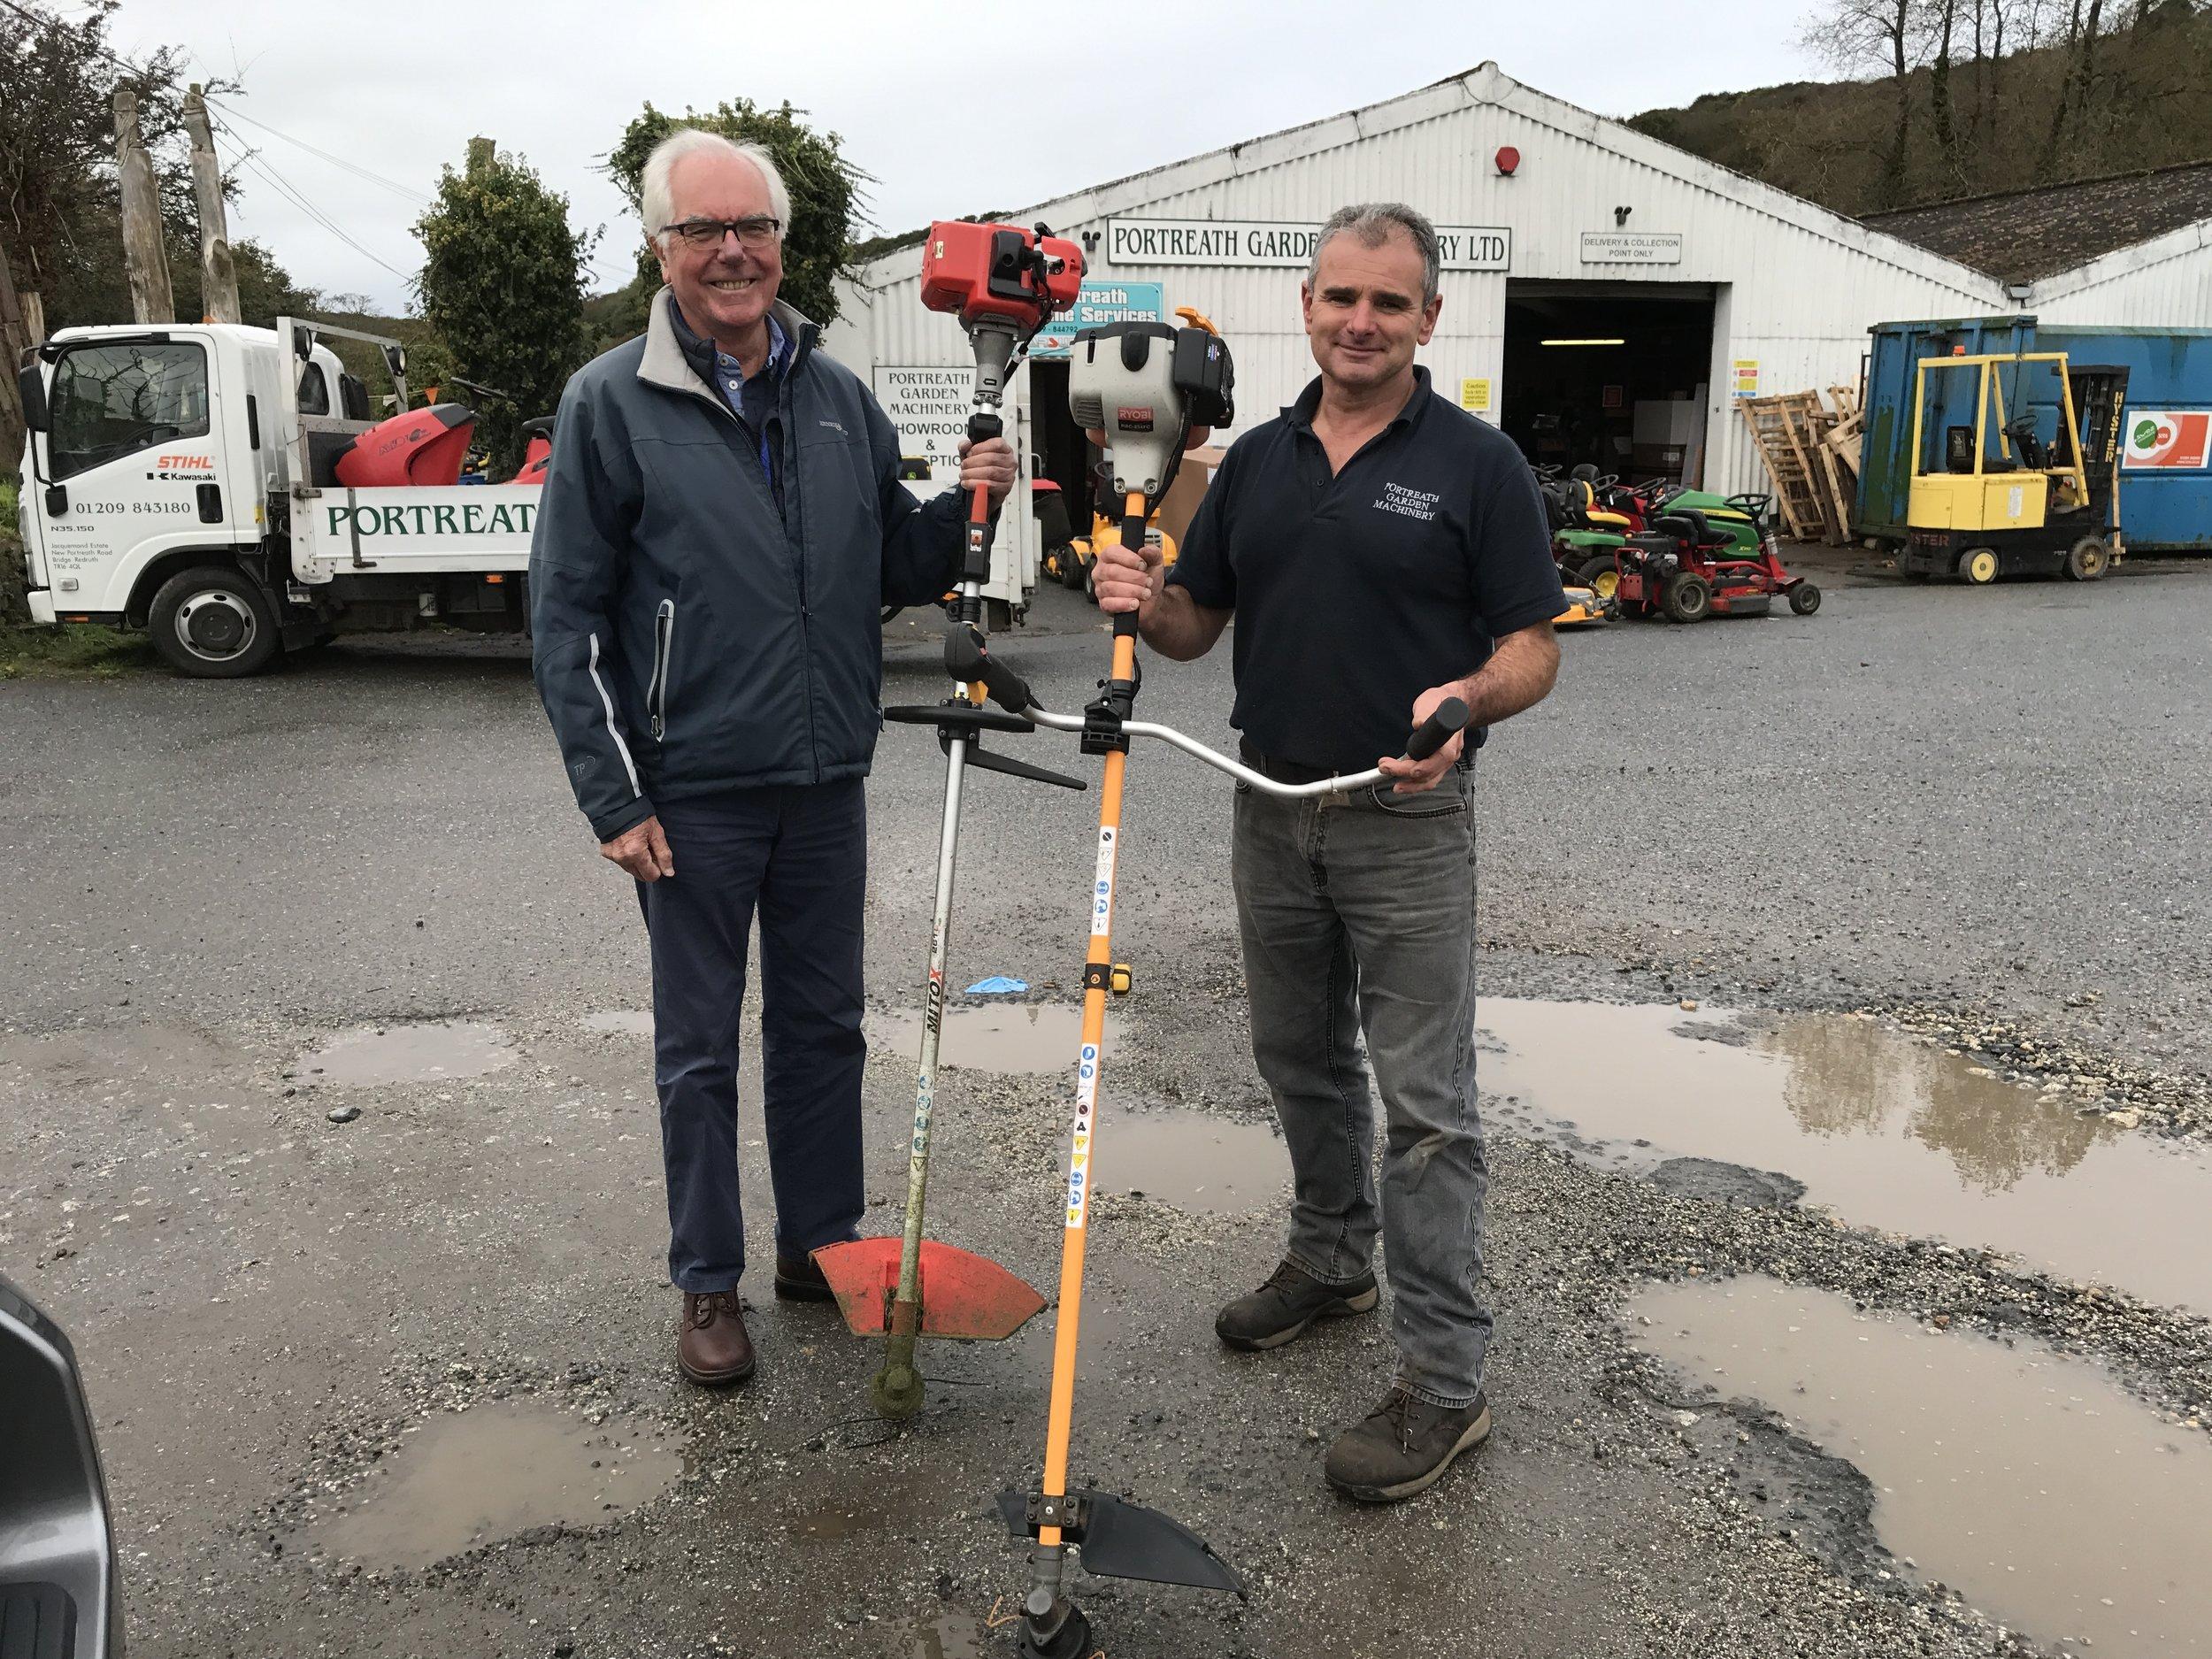 2017-10-09 Donation of 2 strimmers from Steve Stobel of Portreath Garden Machinery.JPG